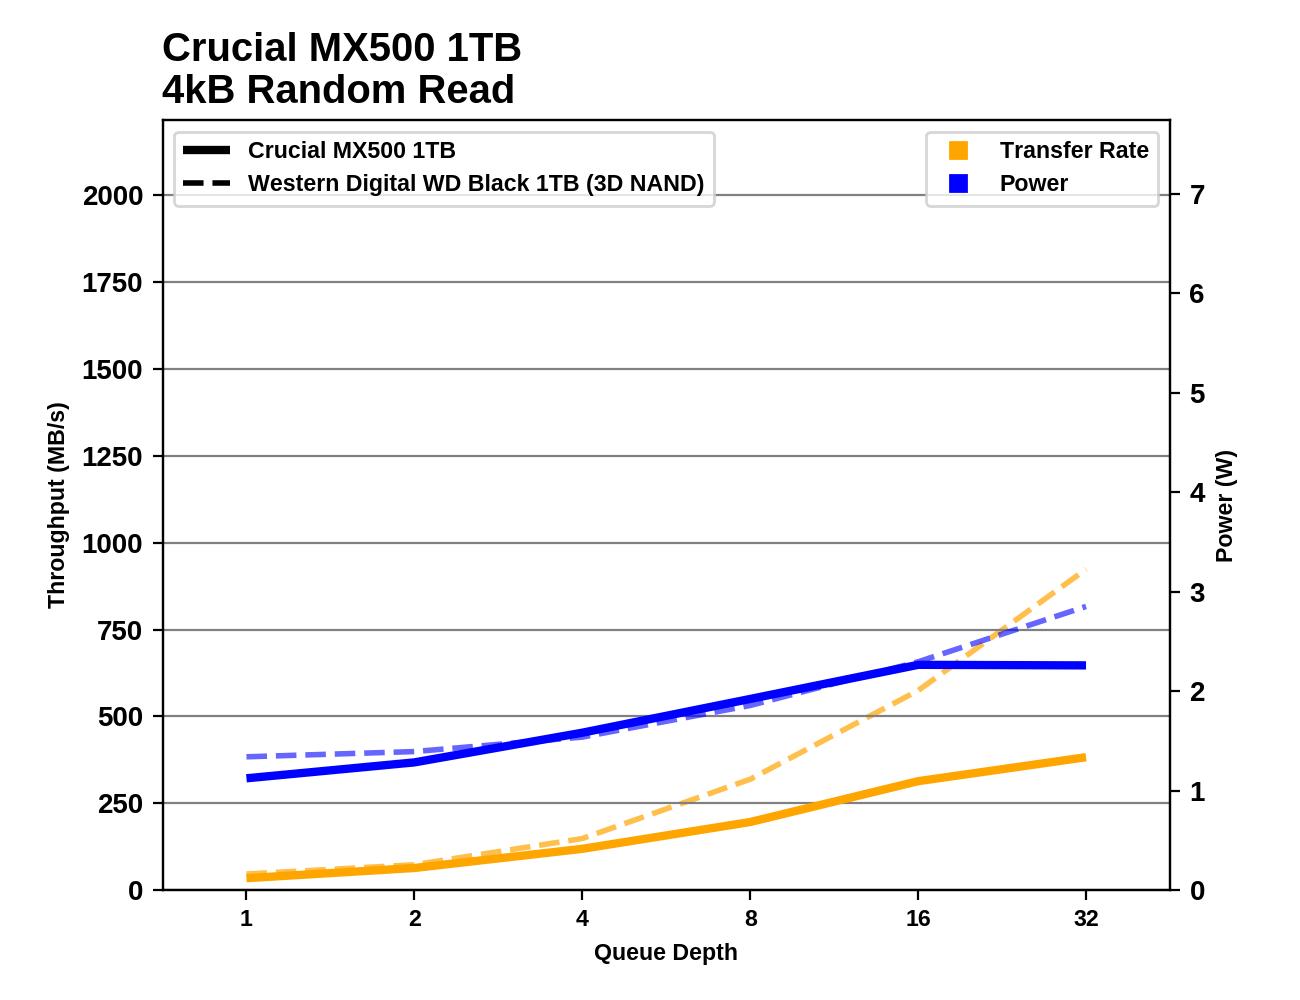 Обзор Western Digital WD Black 3D NAND SSD: EVO встретил равного - 50